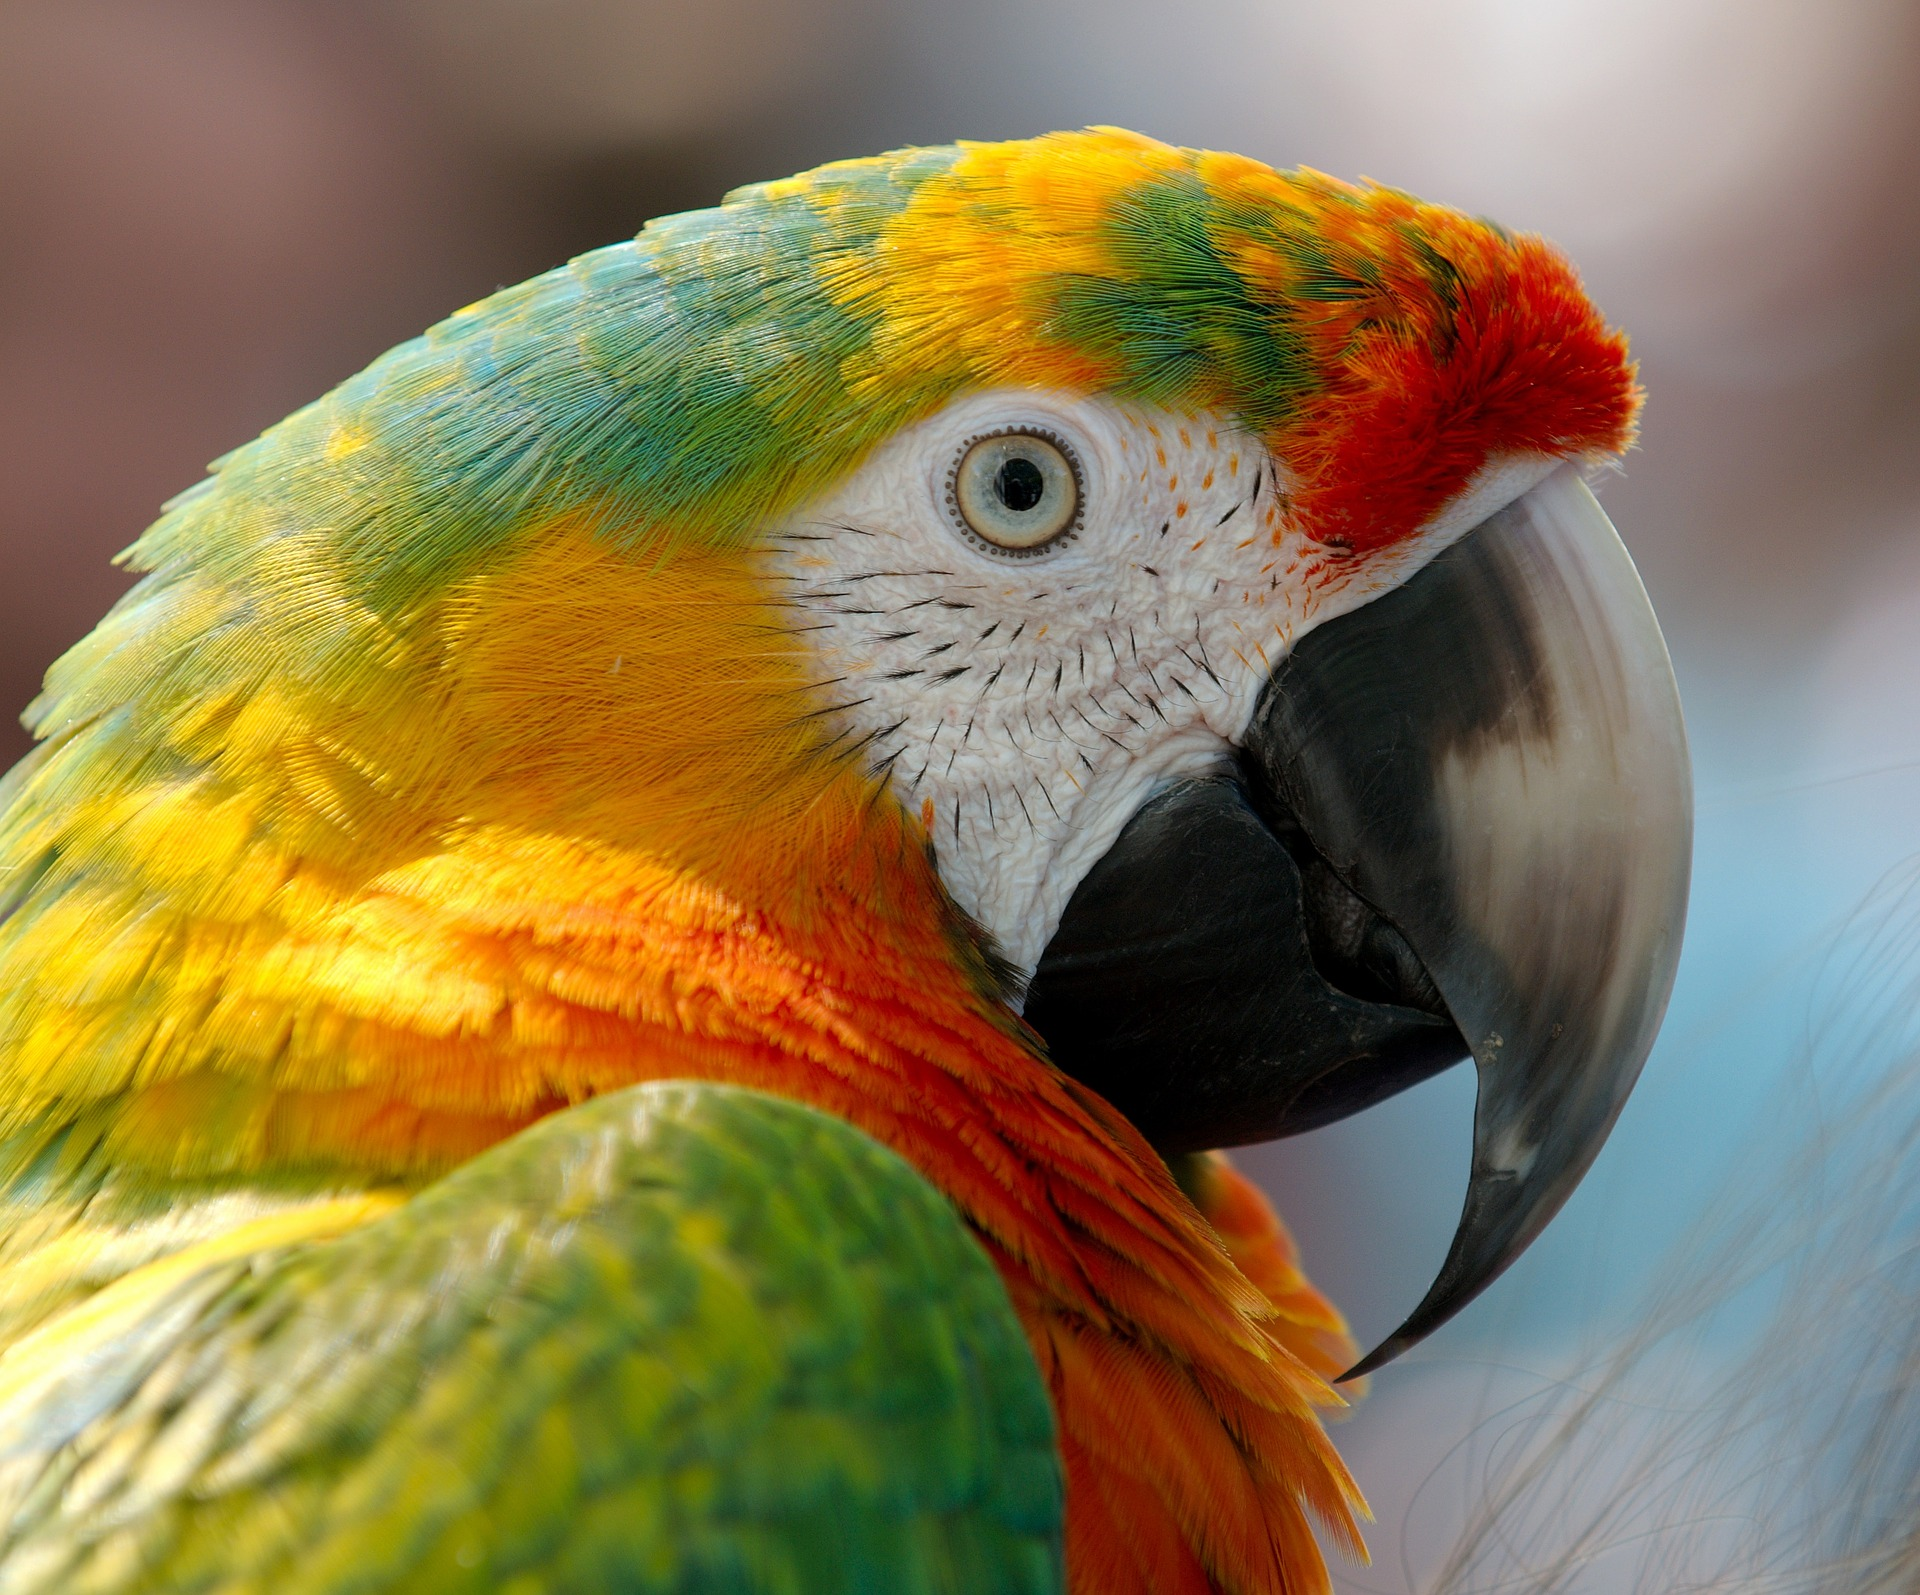 download wallpaper: Macaw papegaai wallpaper